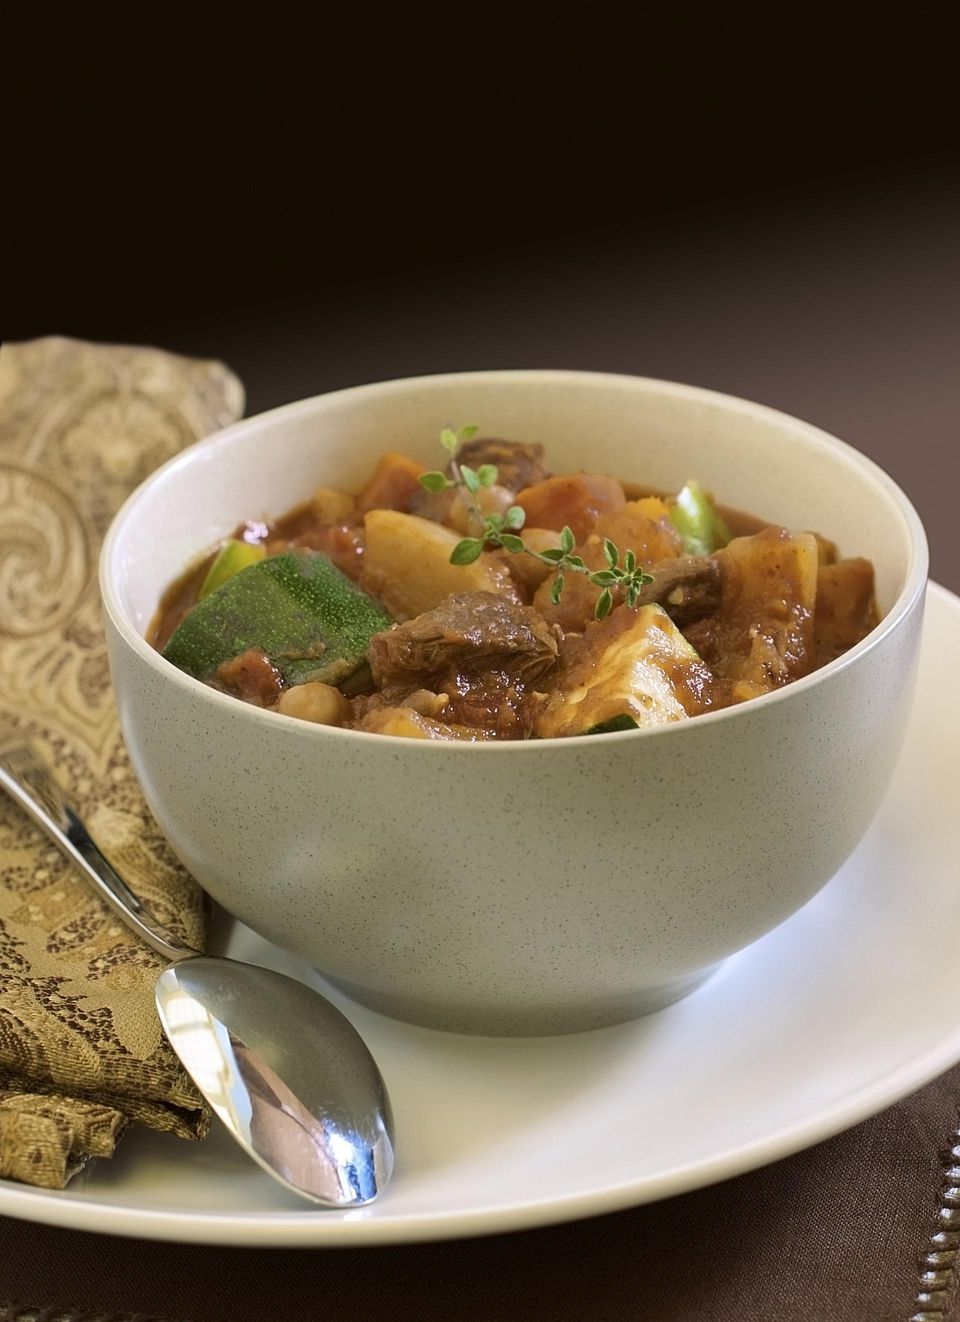 Crockpot Pork and Sweet Potato Stew